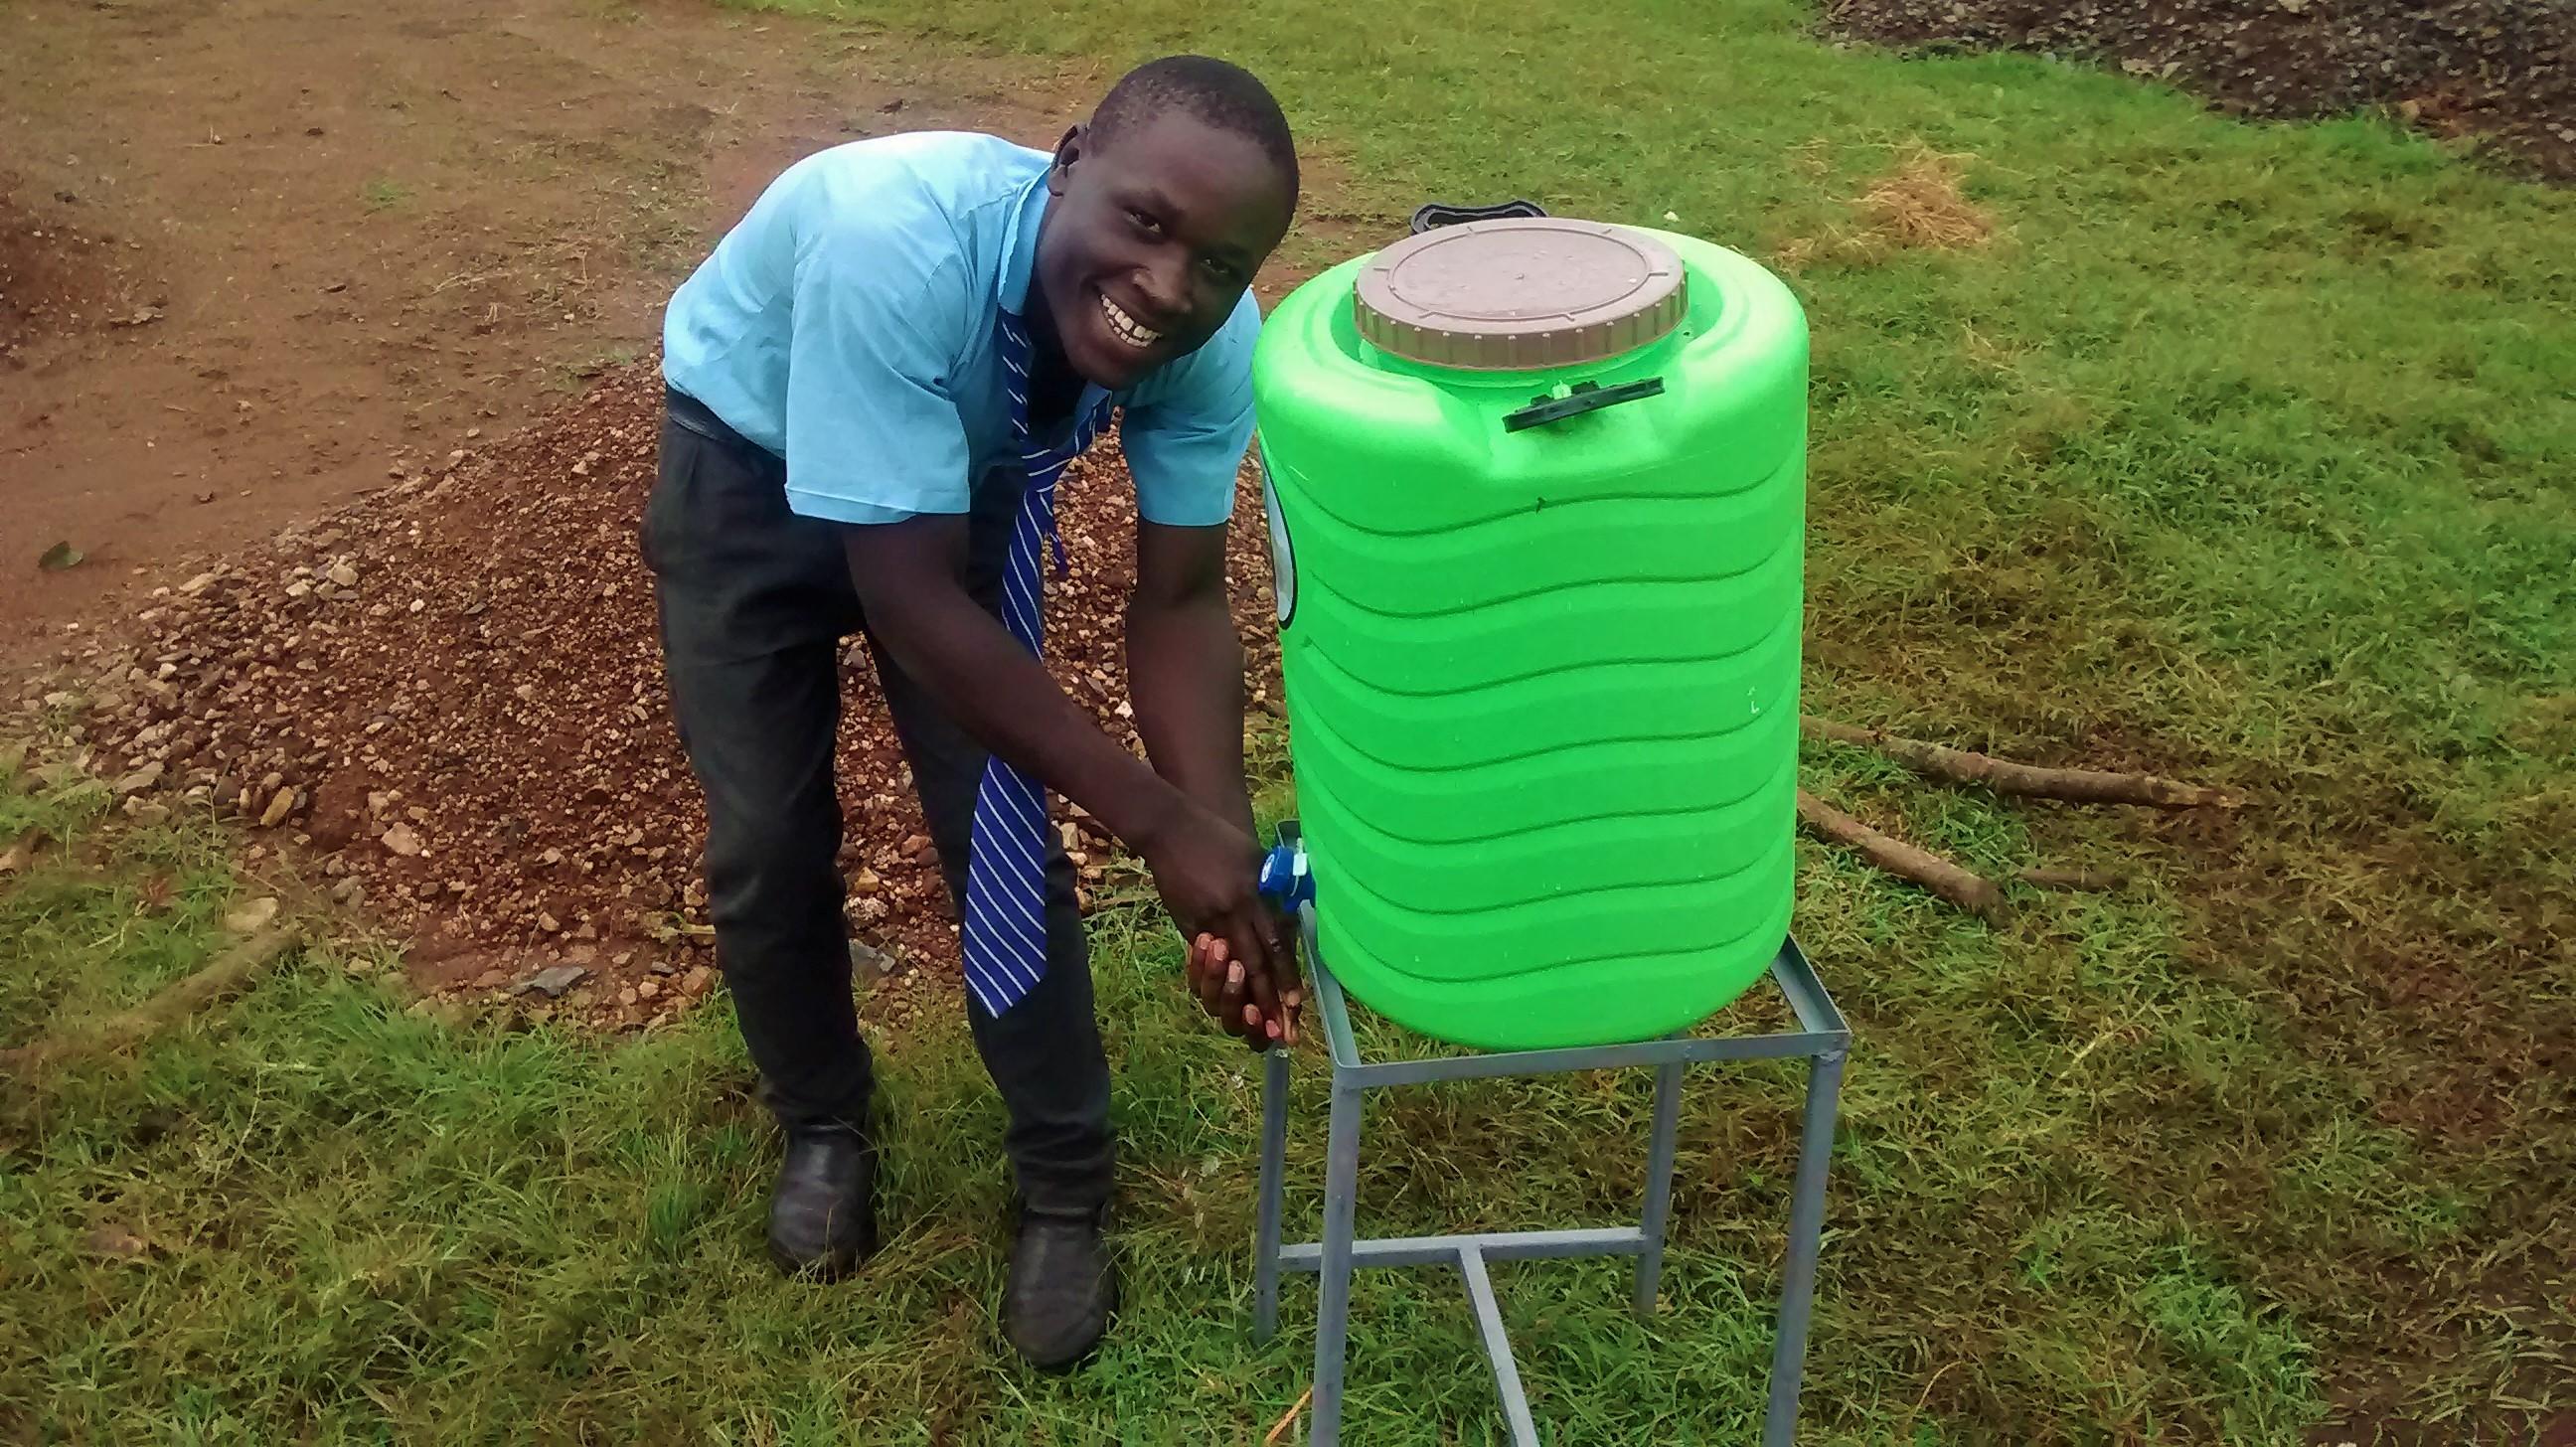 18 kenya4667 hand-washing station